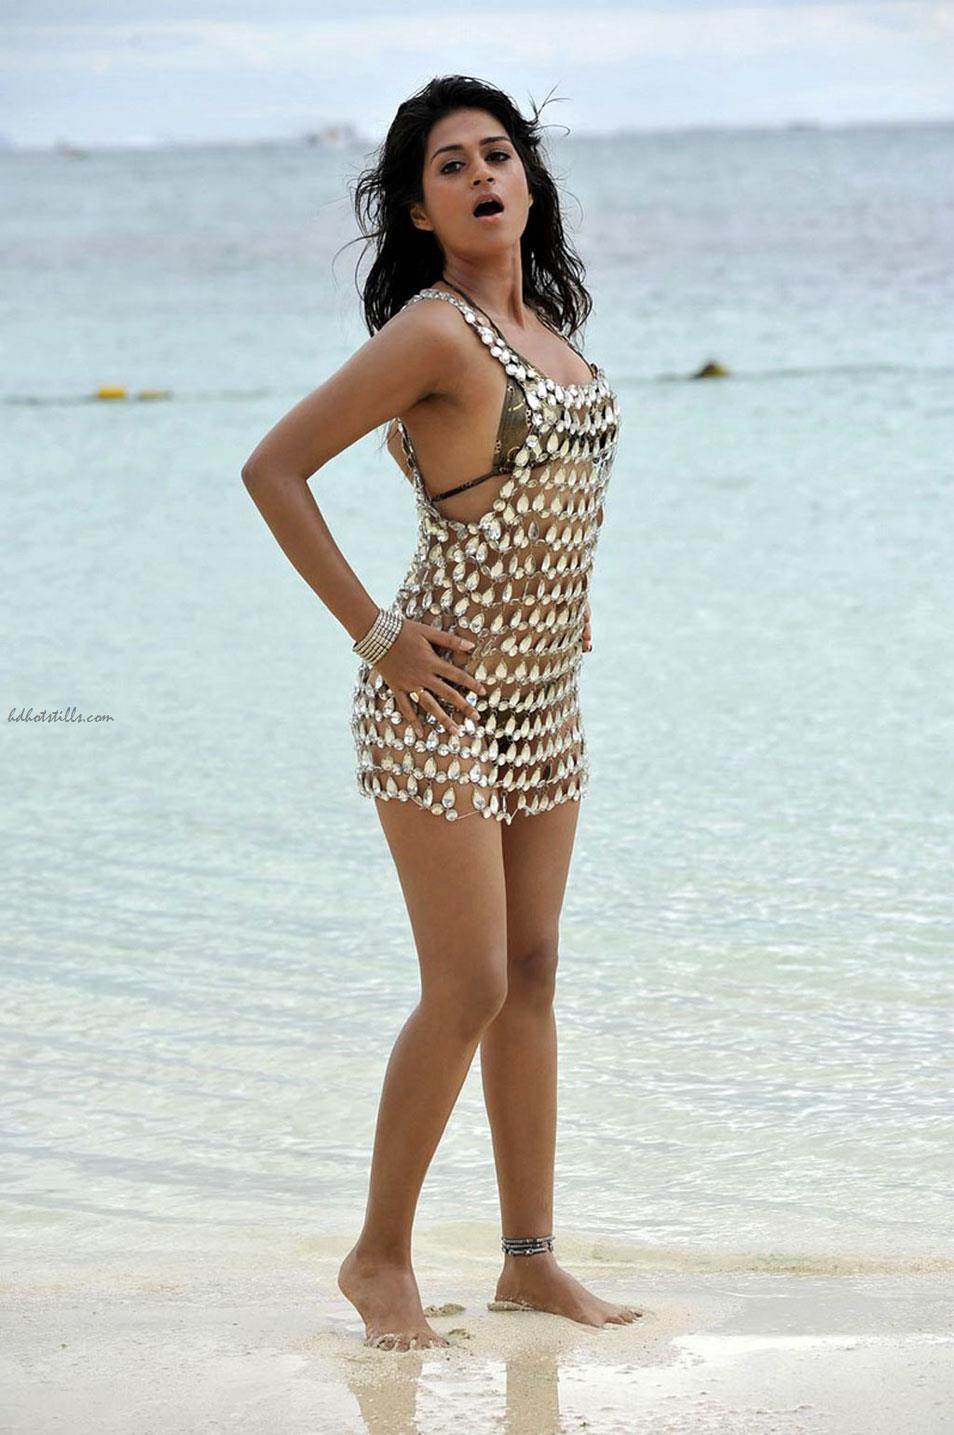 Shraddha das hot bikini thanks